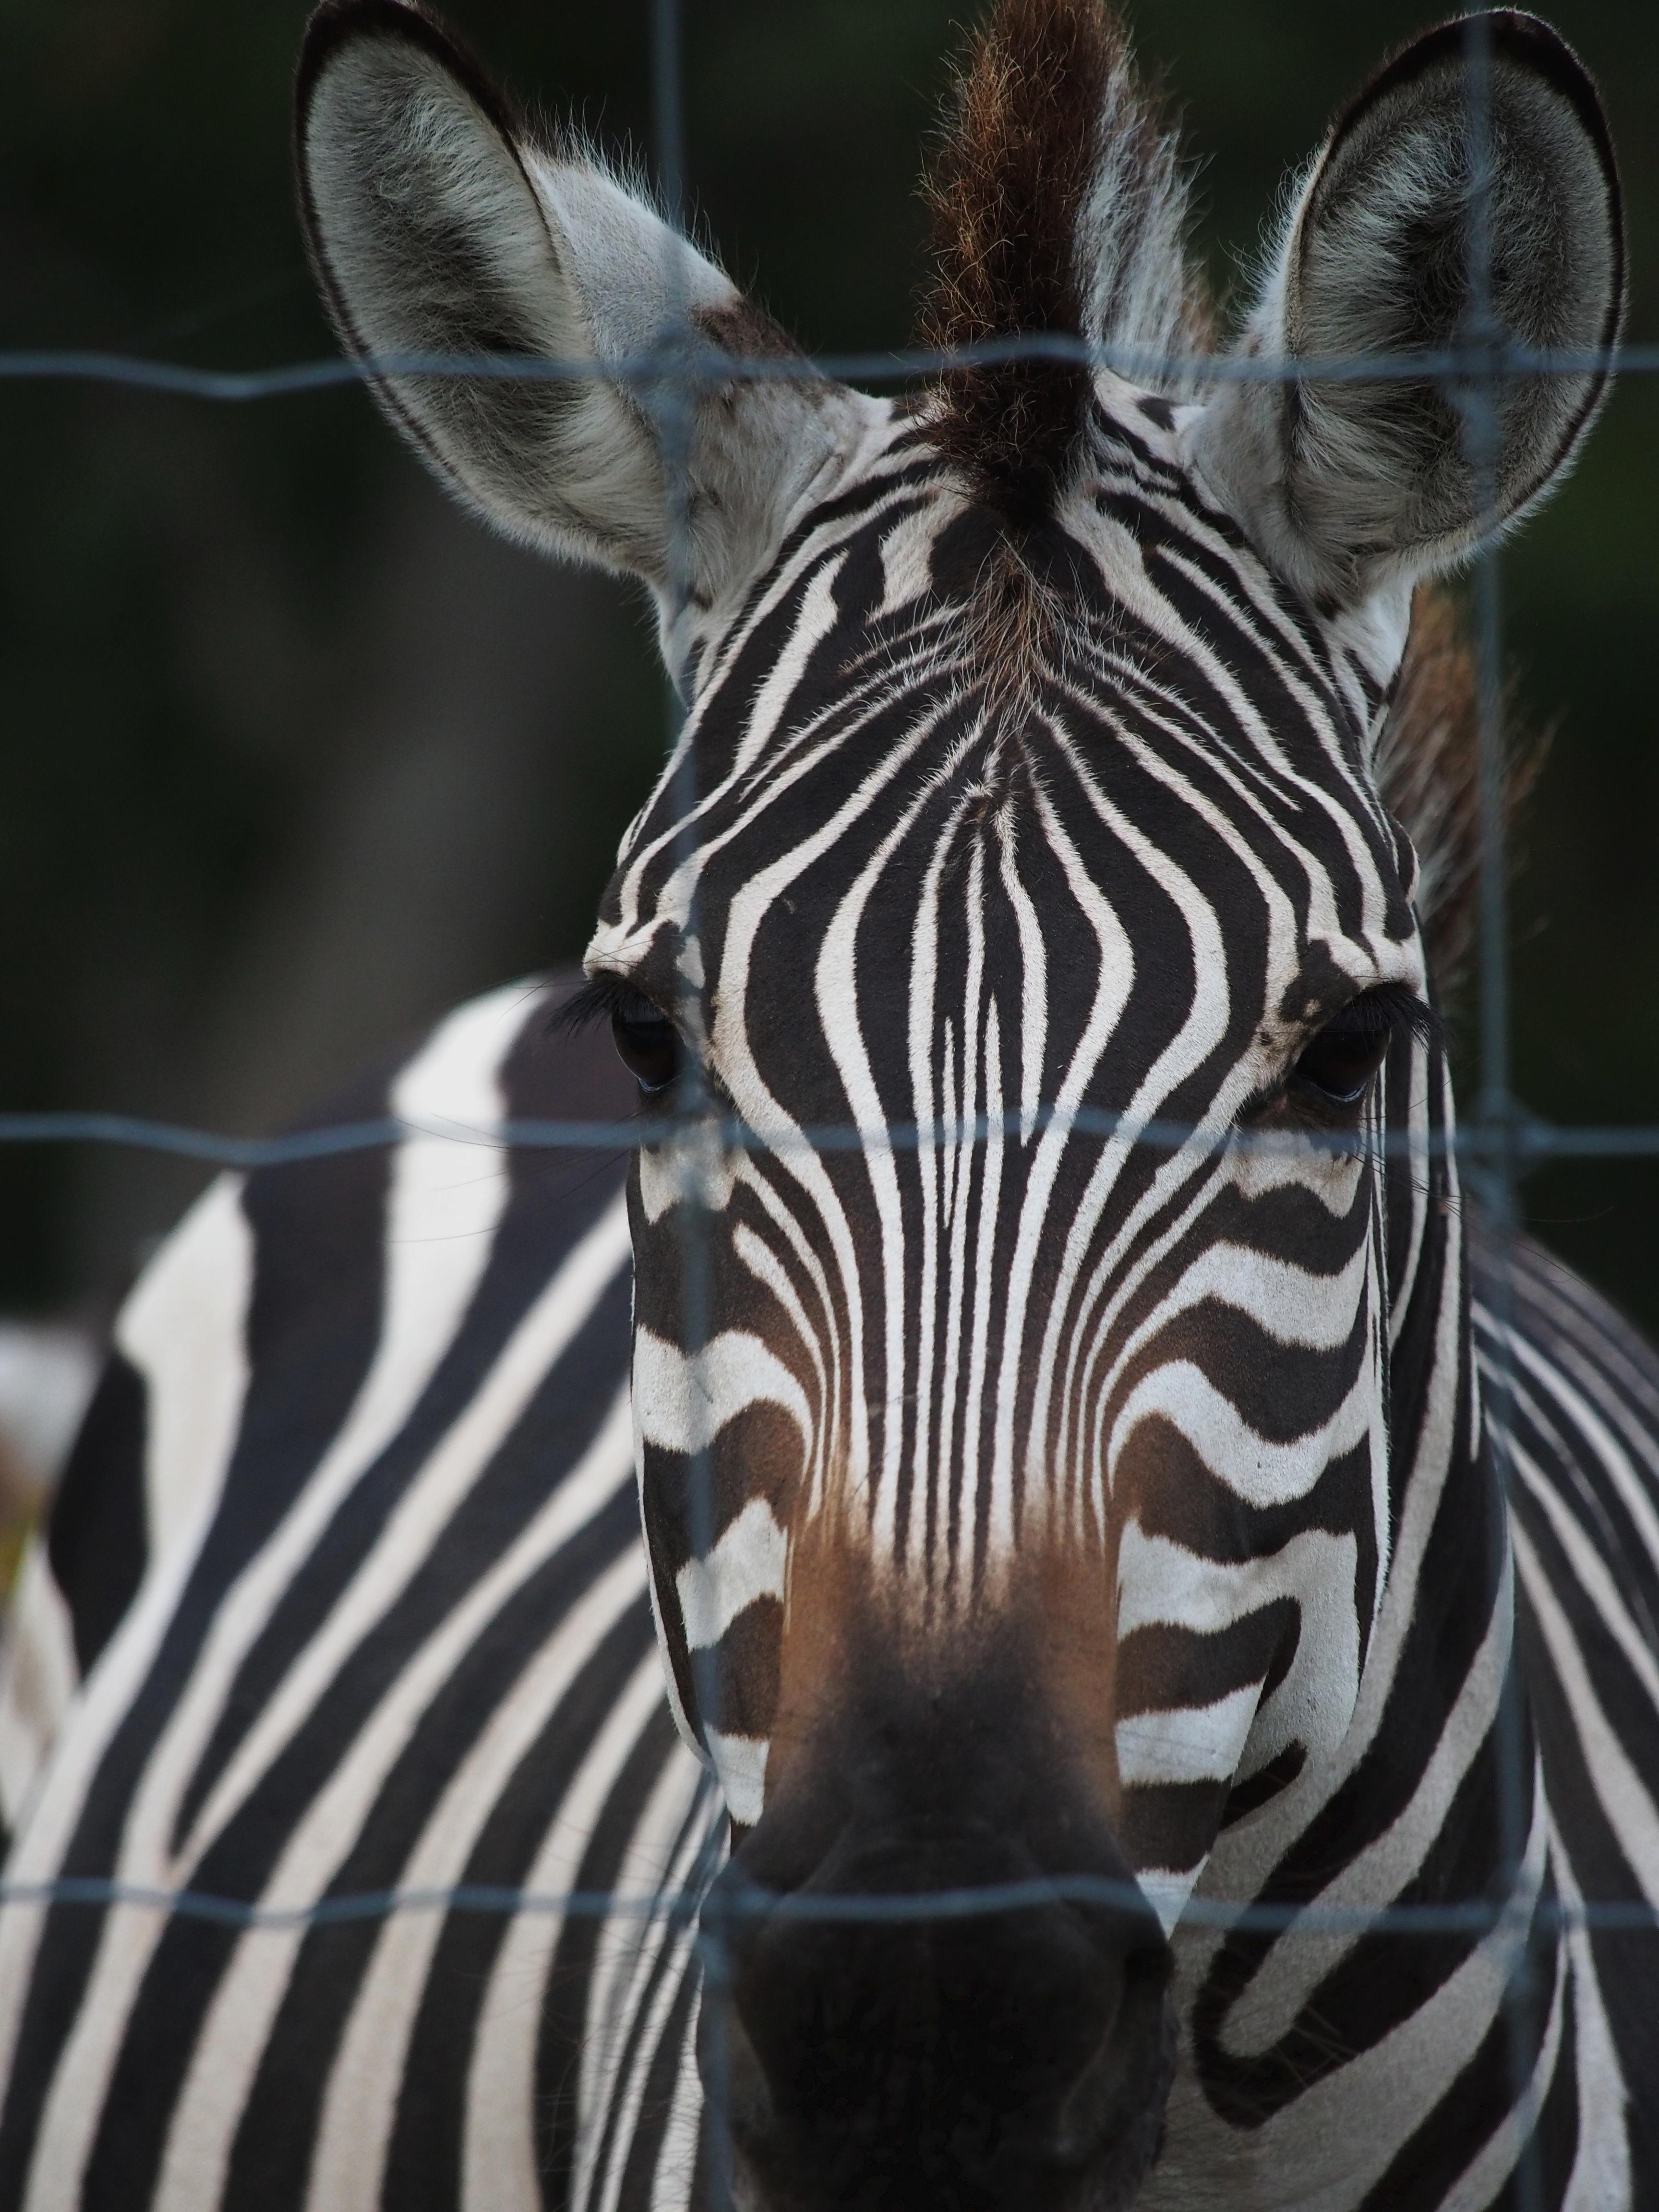 Zebra without stripes real - photo#35